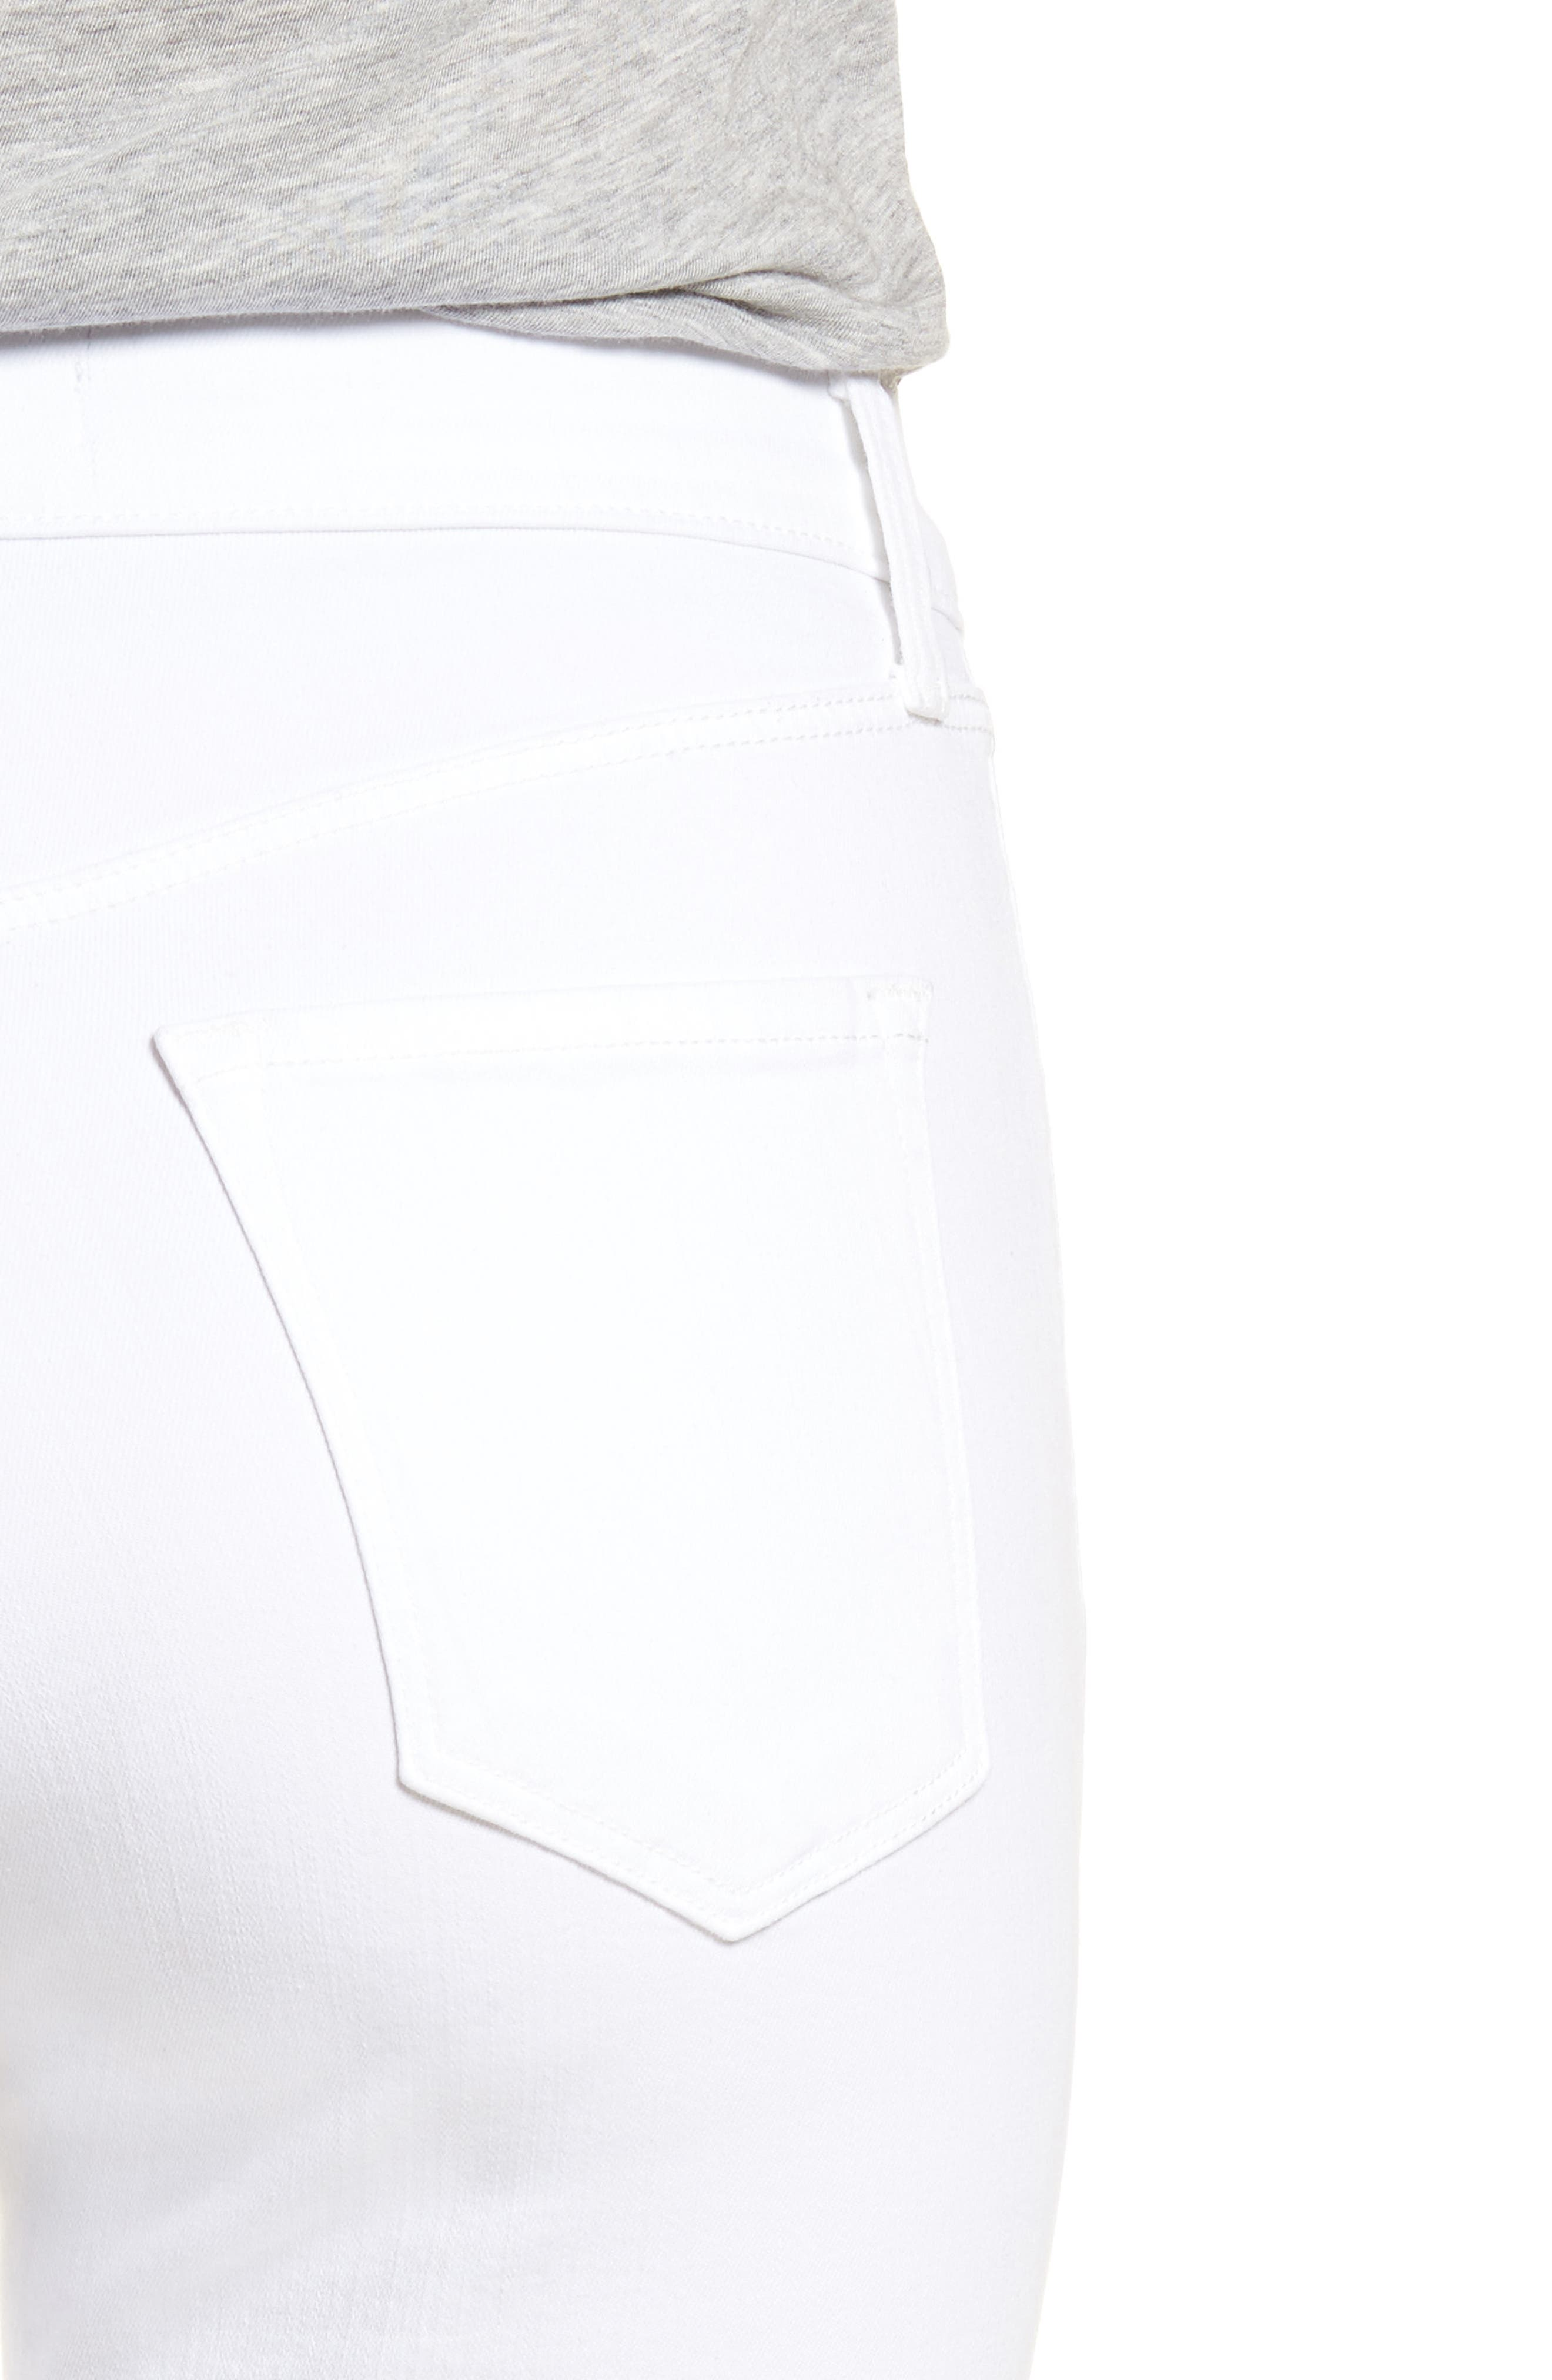 Maria High Waist Skinny Jeans,                             Alternate thumbnail 4, color,                             White